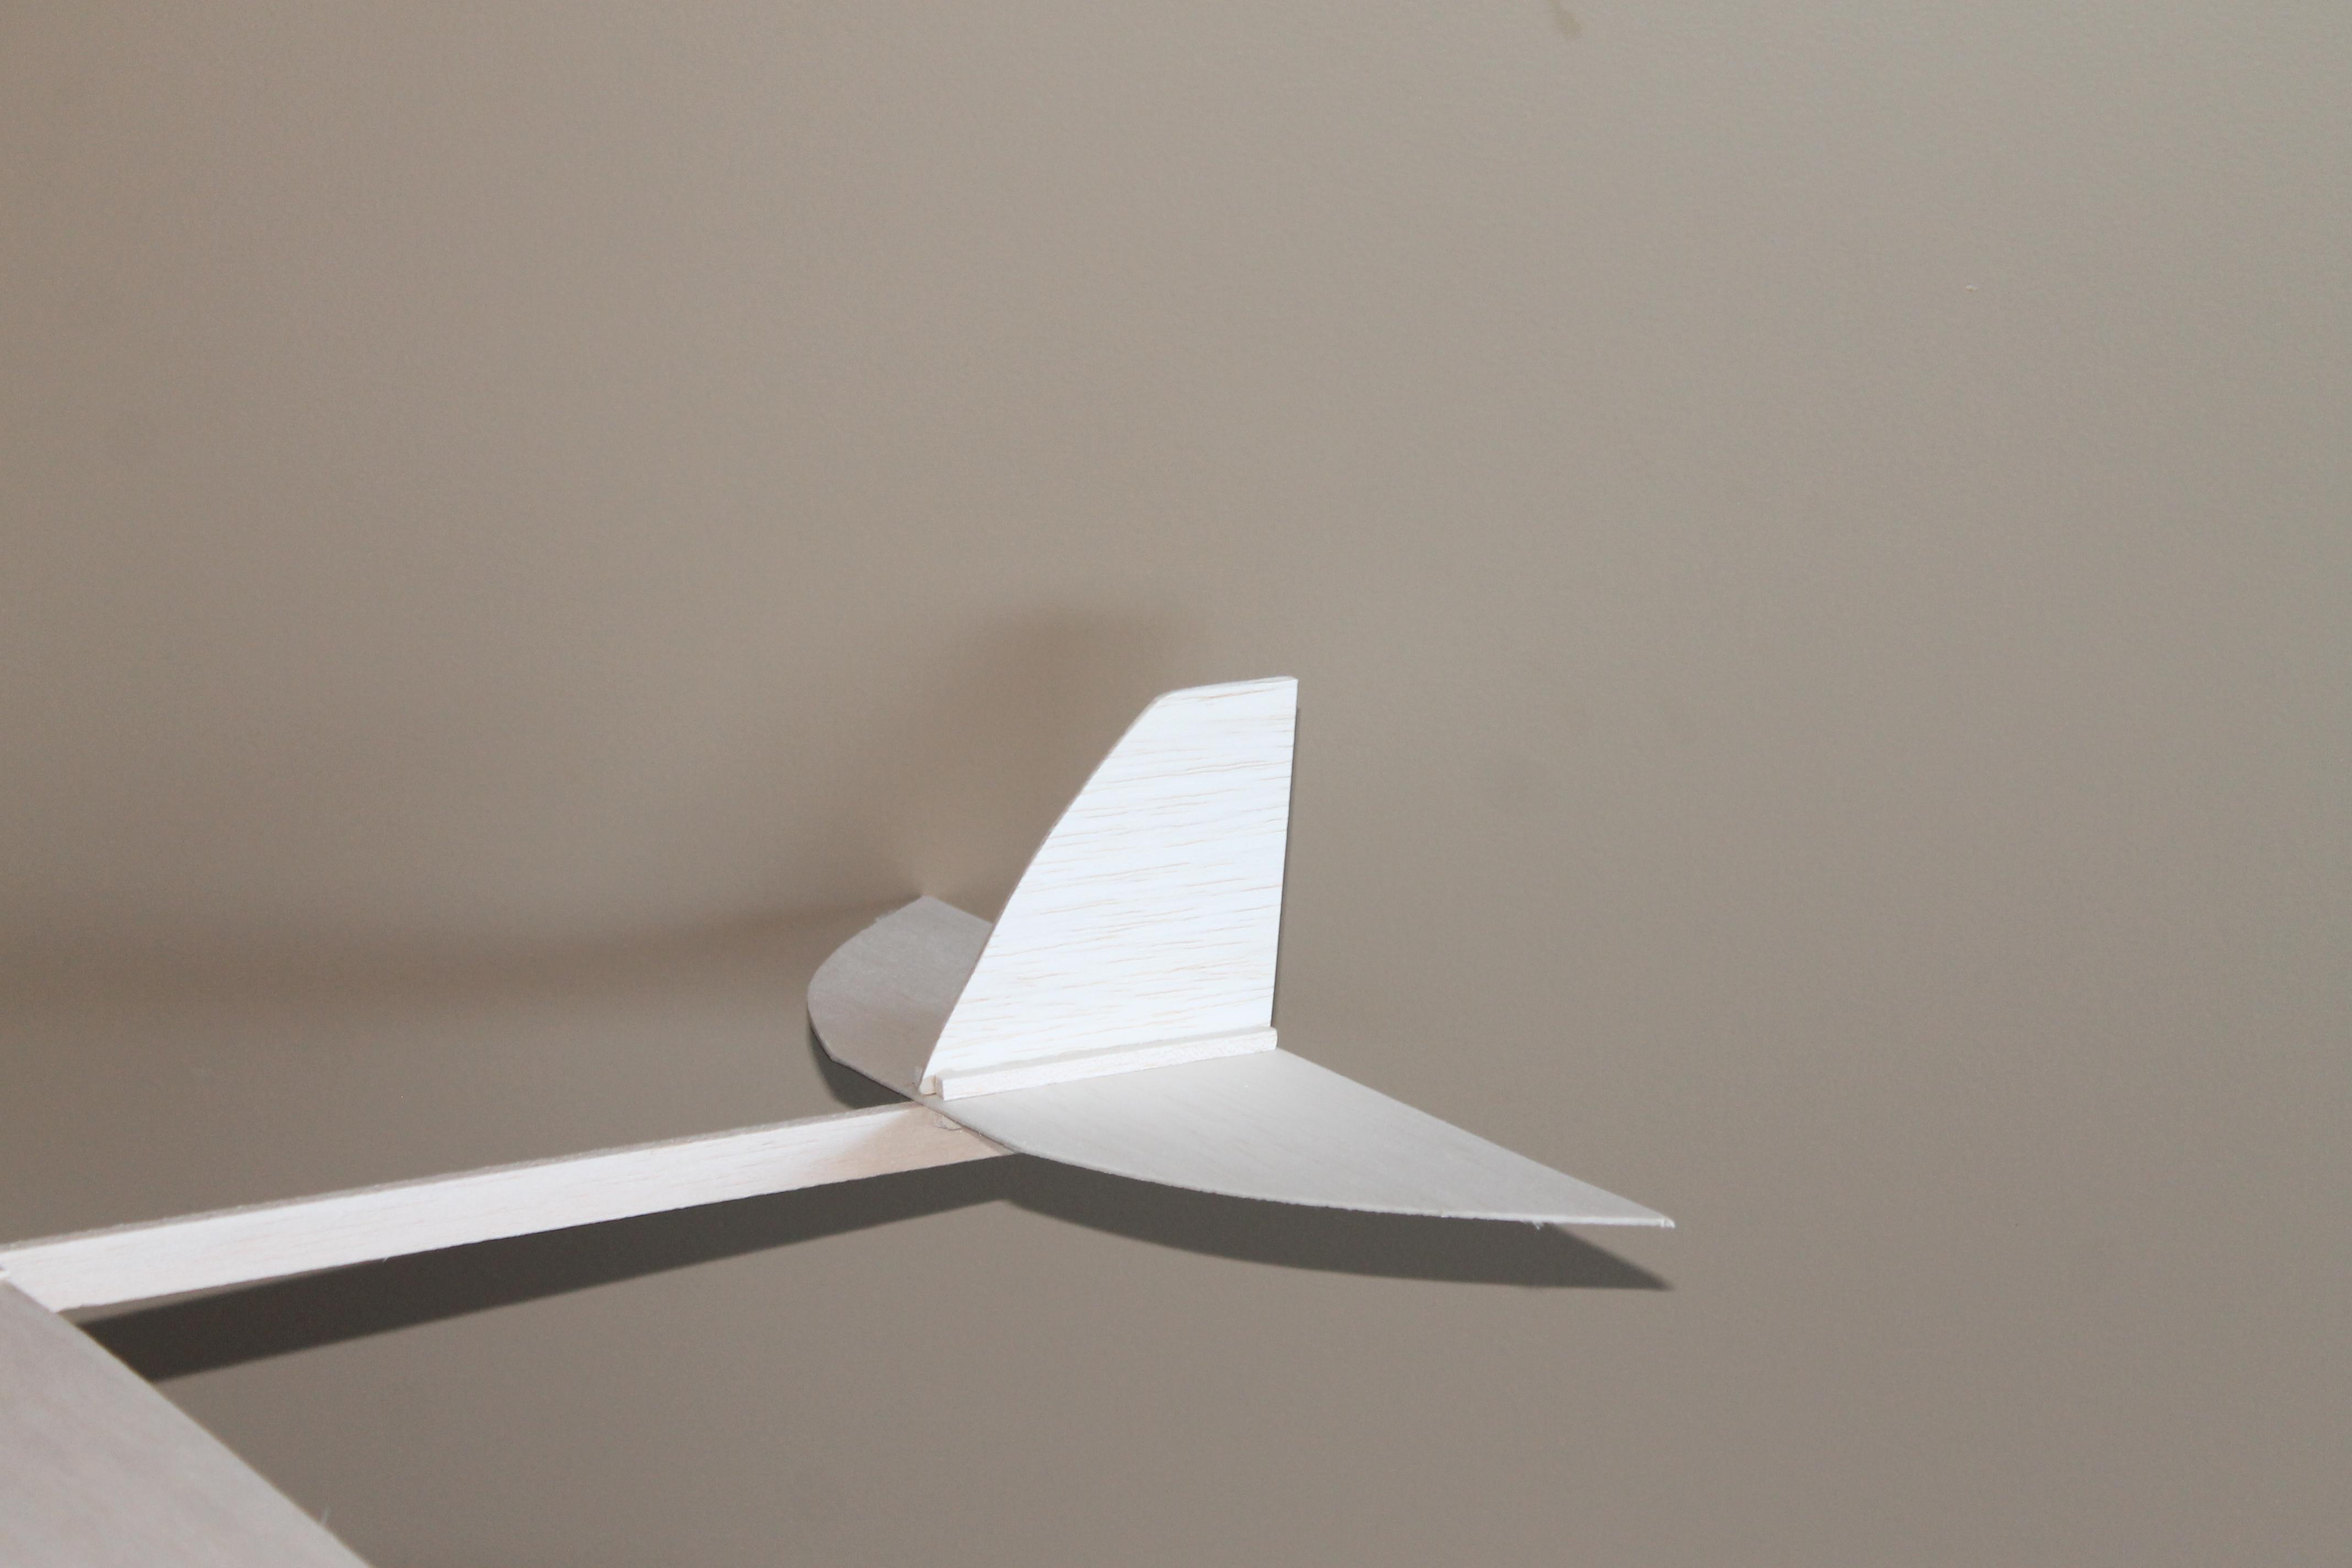 Picture of Bevestiging Vaste Vleugels En Staart